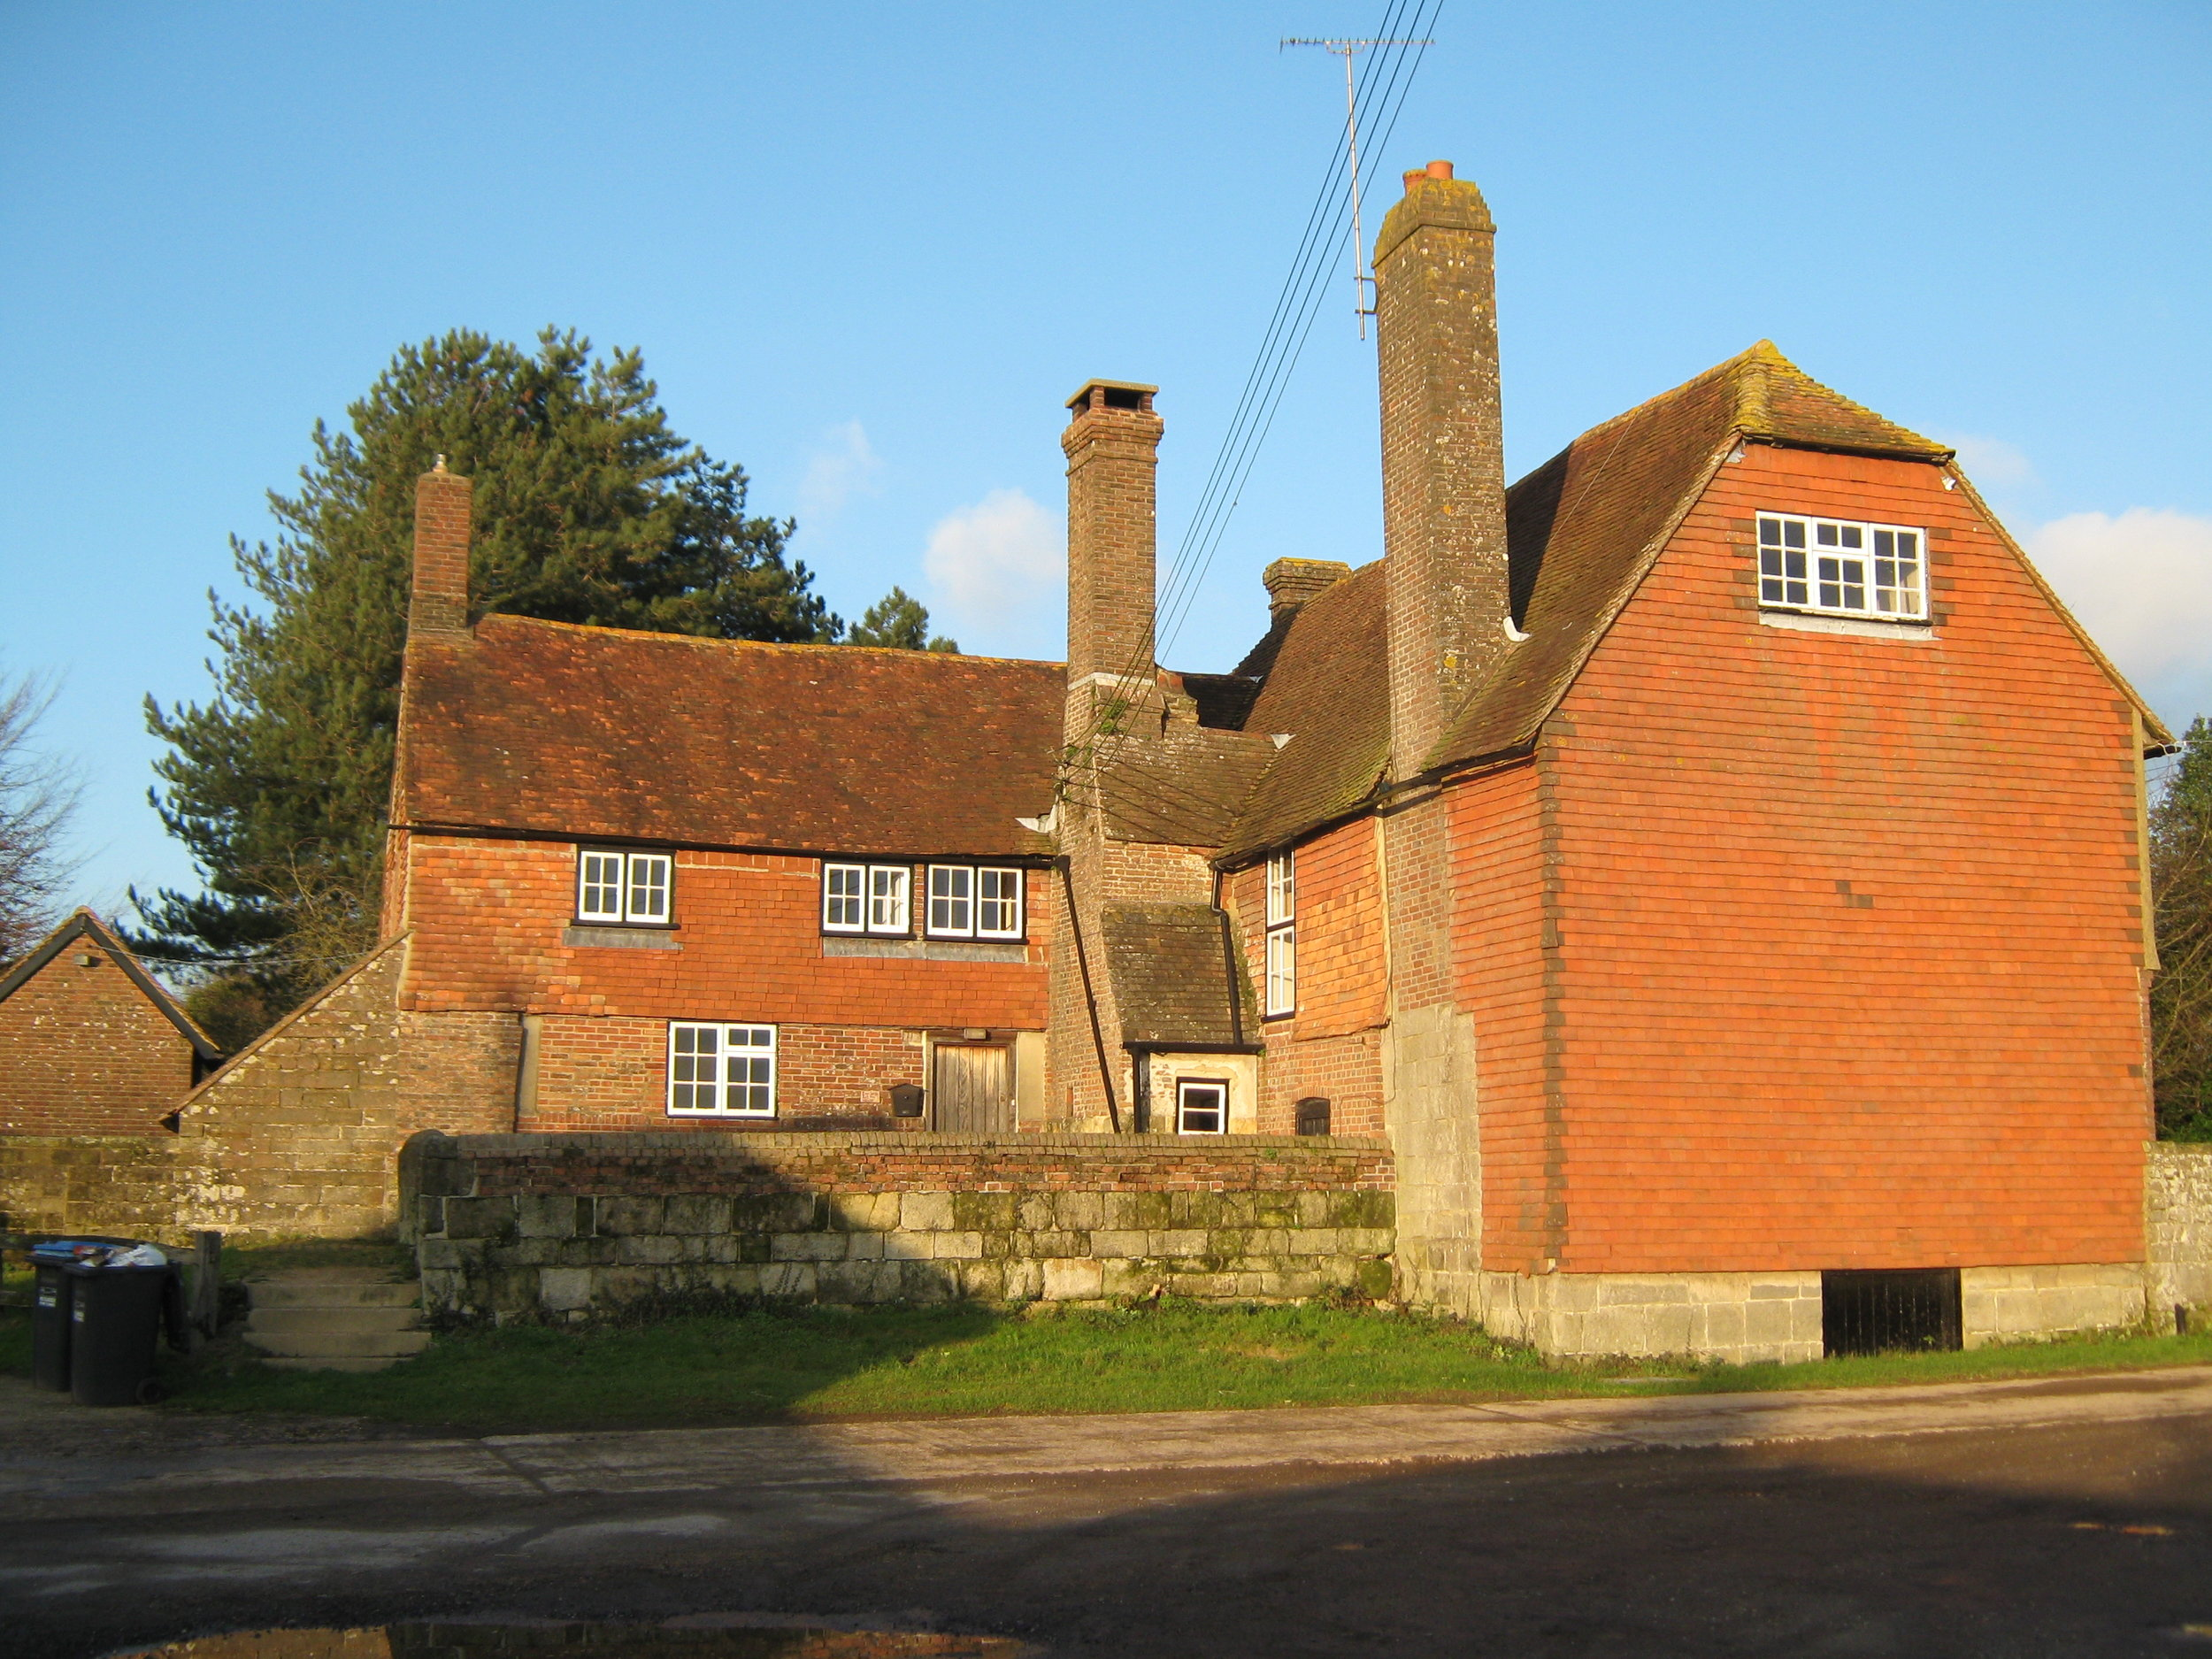 Bowders Farmhouse 009.jpg